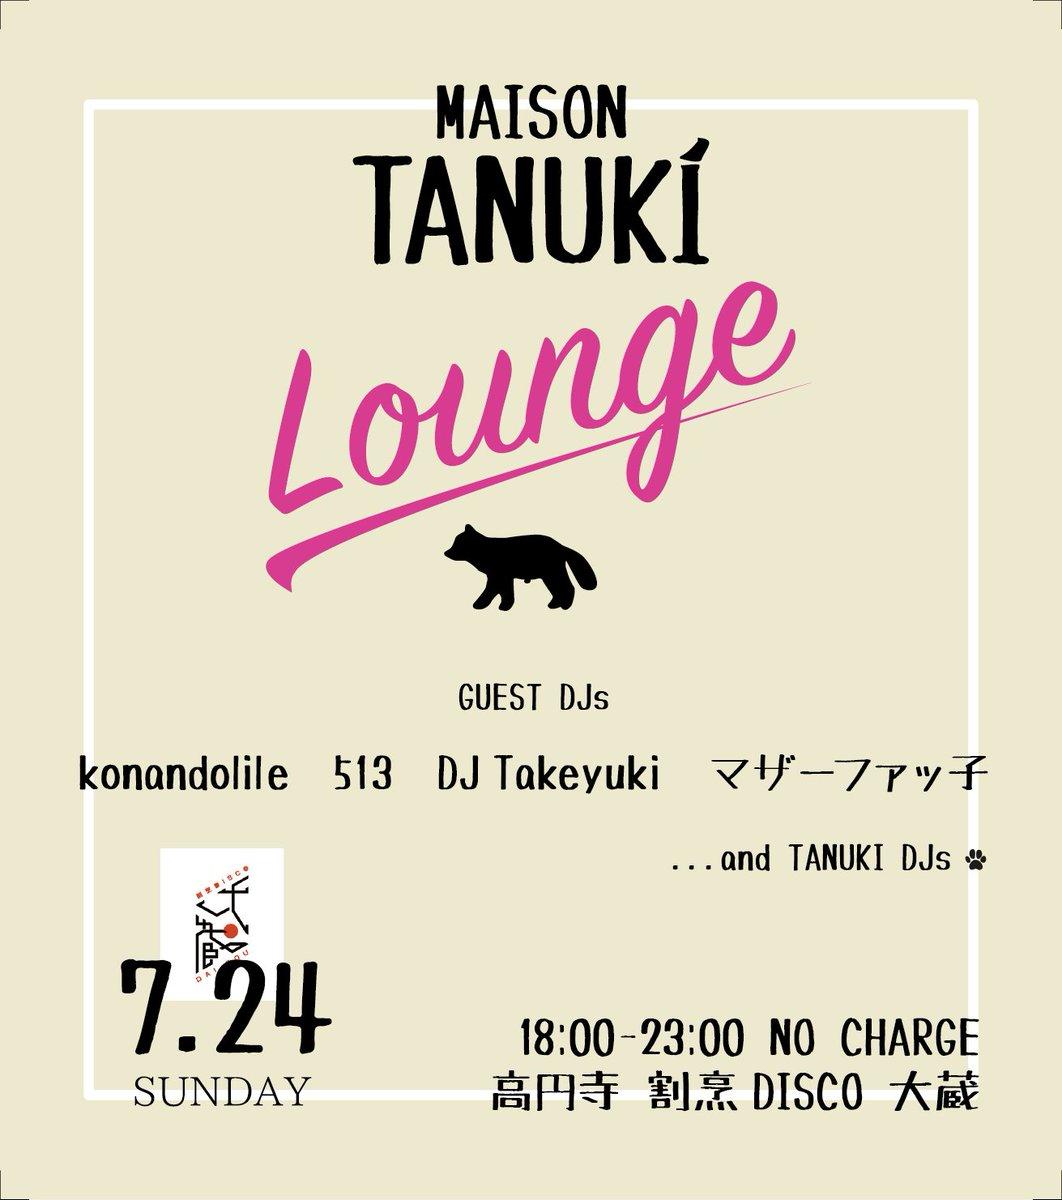 MAISON TANUKI Lounge やります!チャージフリーですので、是非。 https://t.co/S5xfLE6hLu